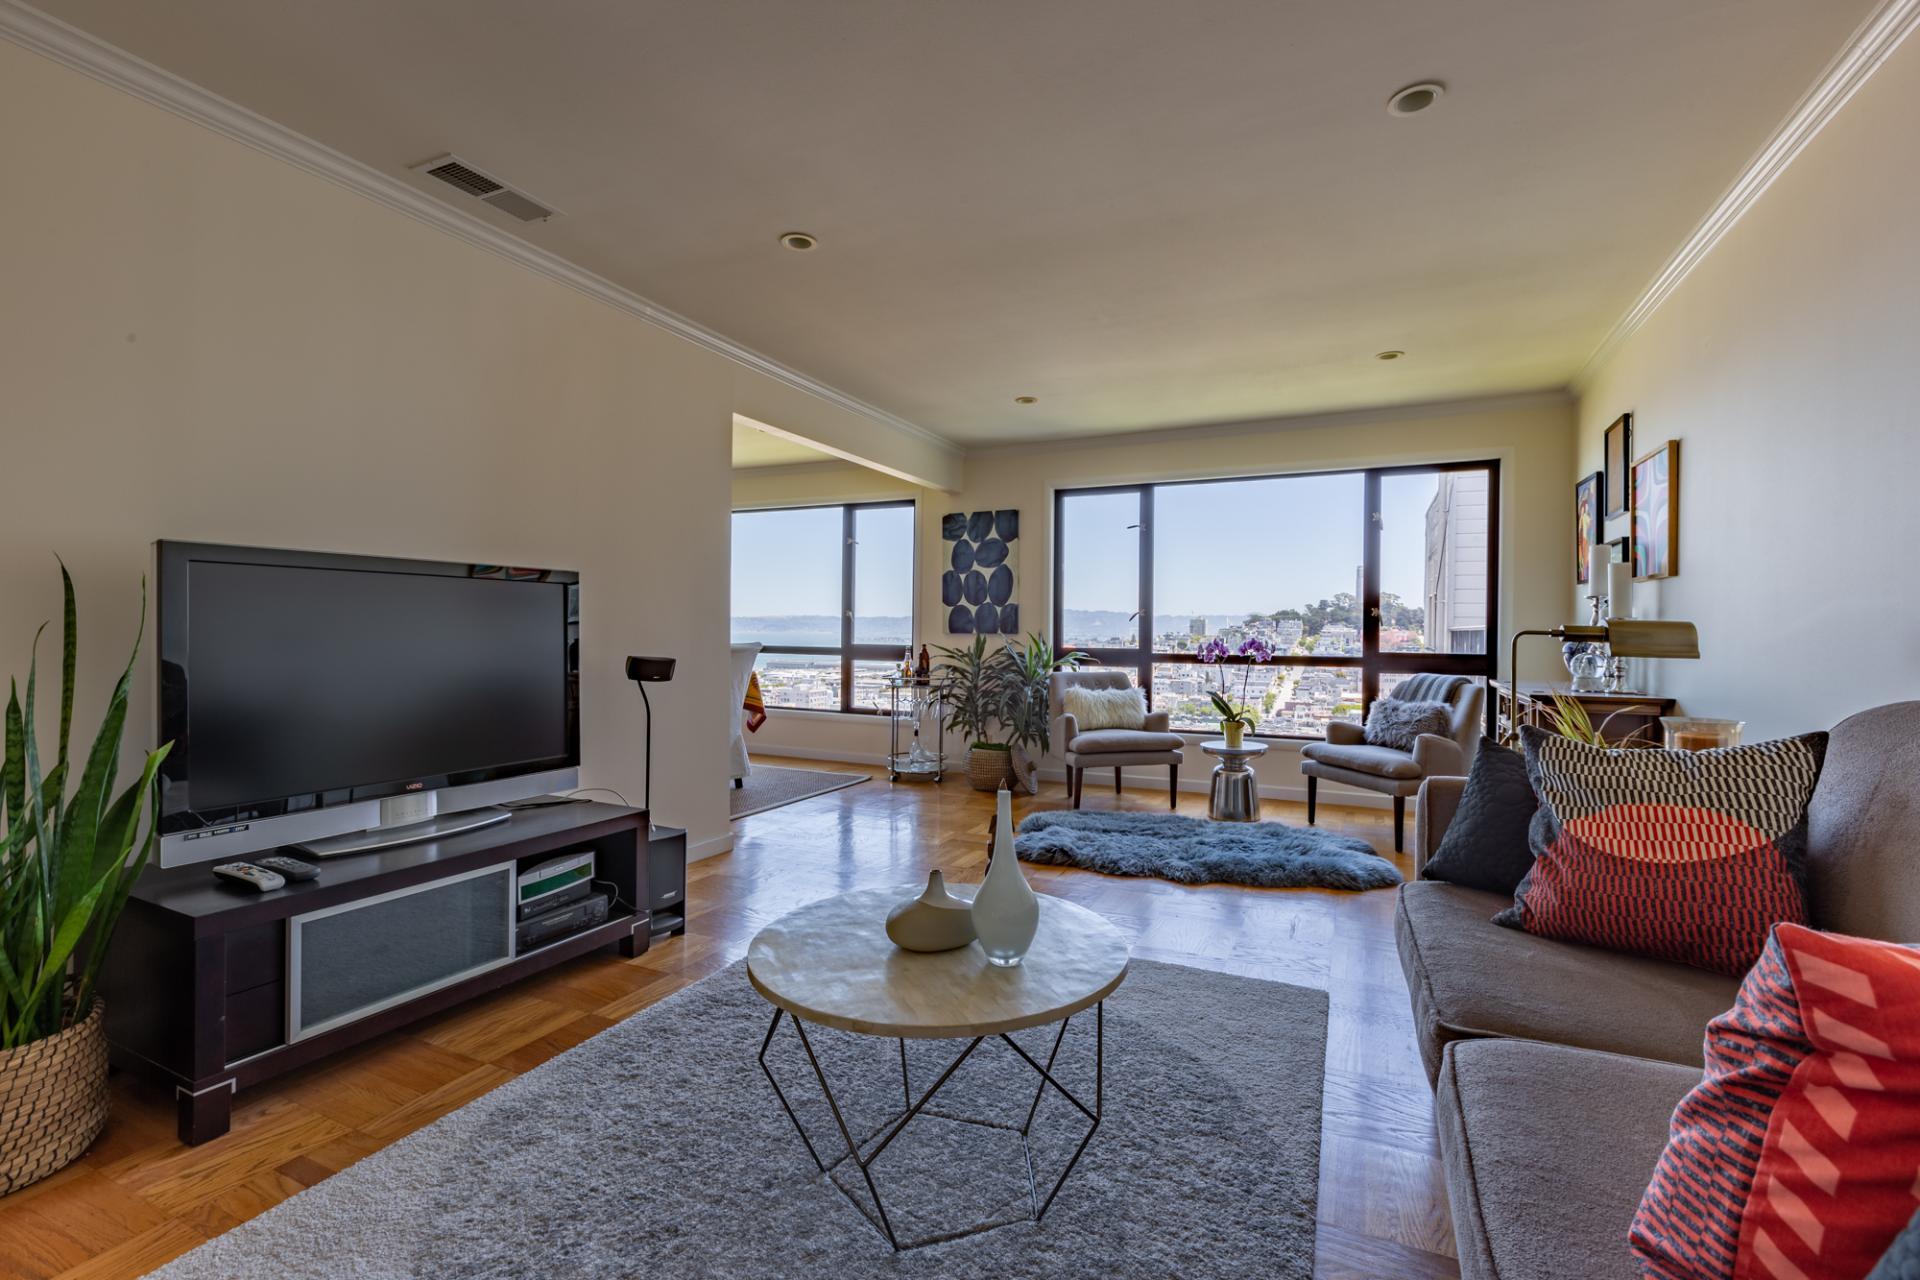 TV at Leavenworth Street Apartment, Russian Hill, San Francisco